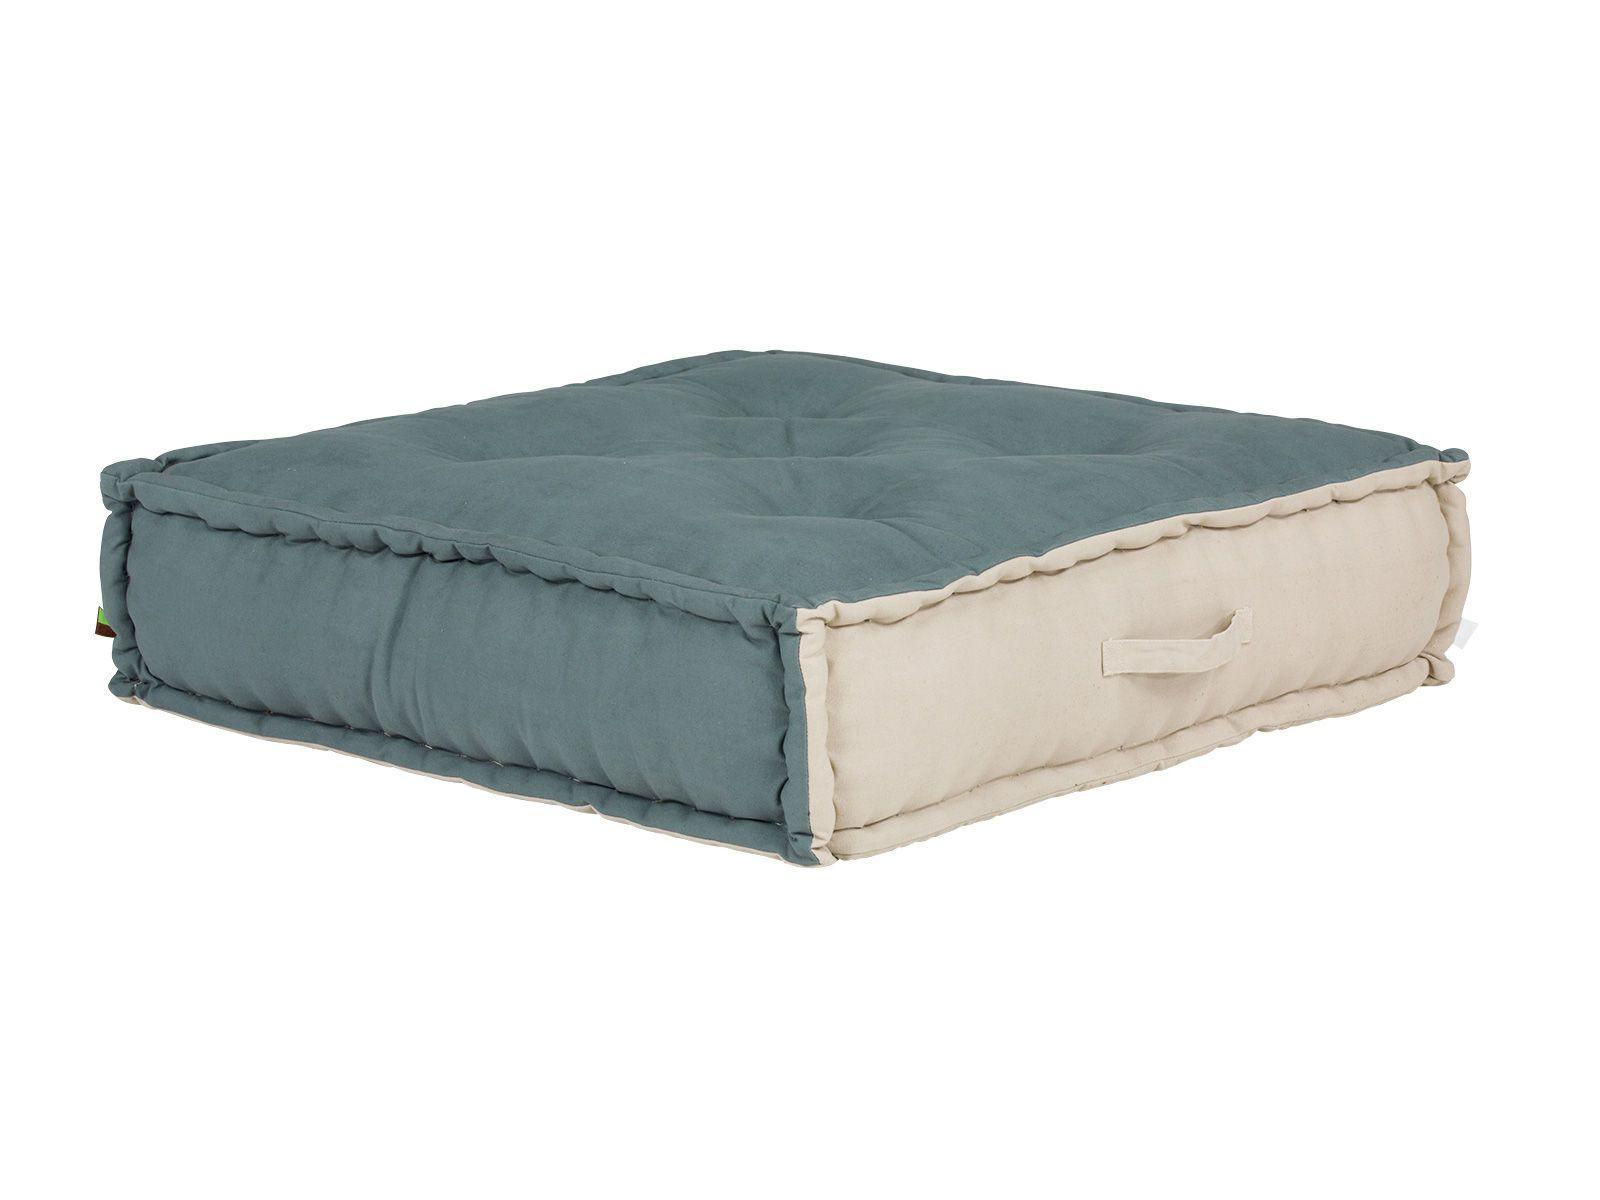 Matratzenkissen 80x80  Bodenkissen Caribou | Kinderzimmer | Pinterest